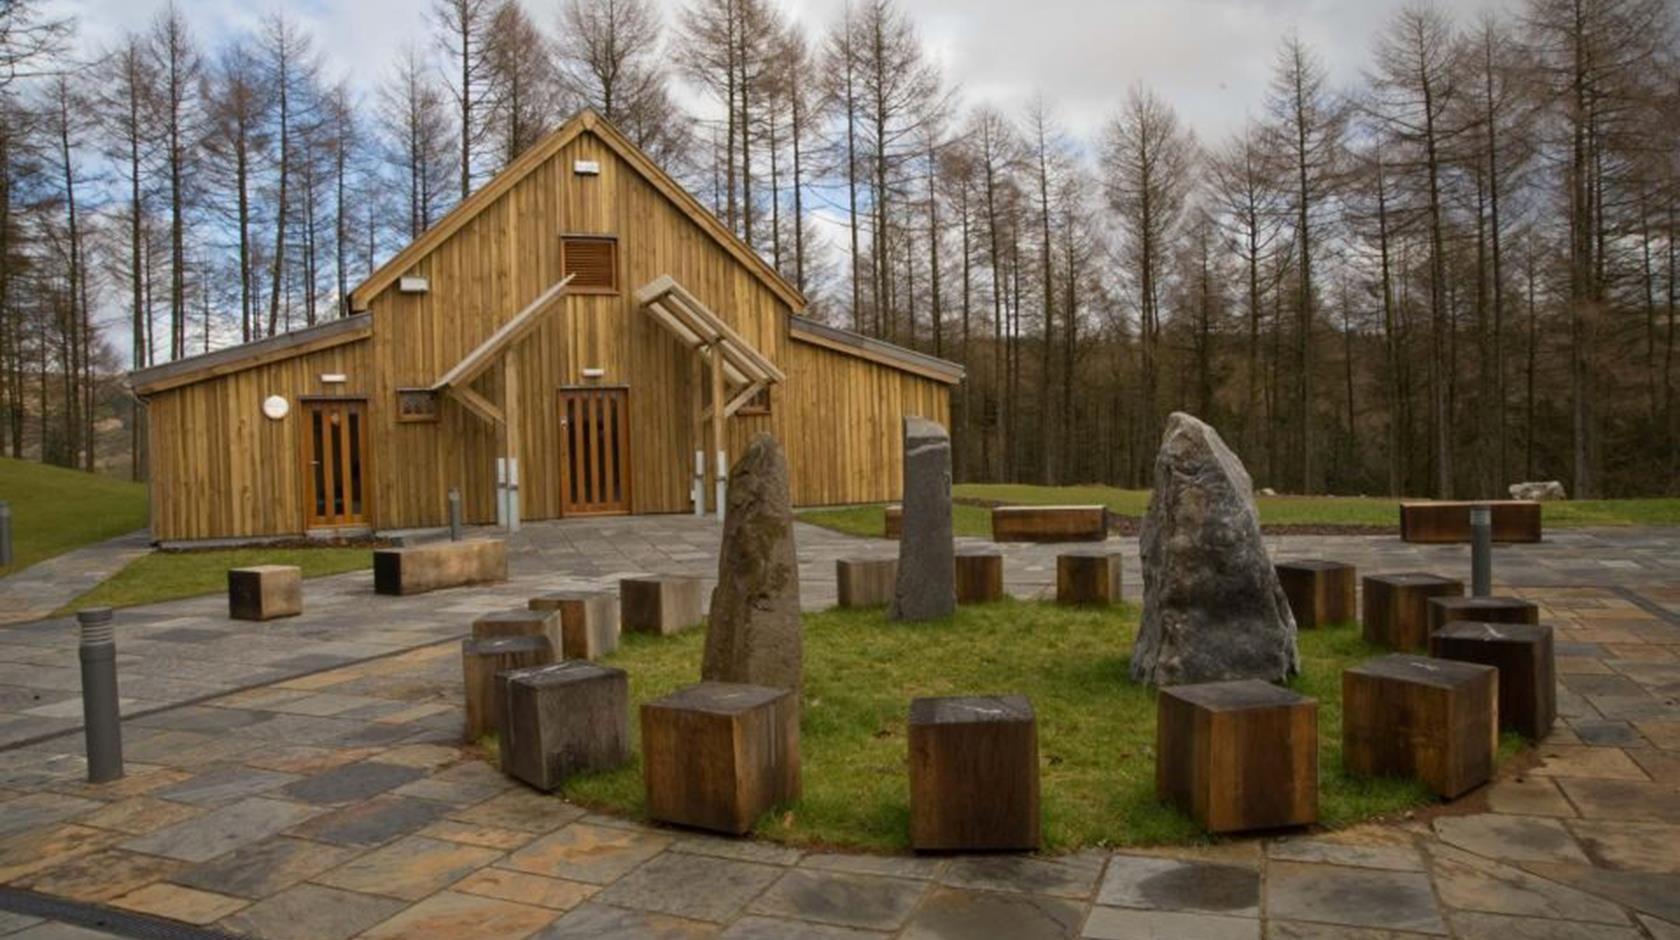 Garwnant Visitor Centre Visitor Center Merthyr Tydfil Family Days Out